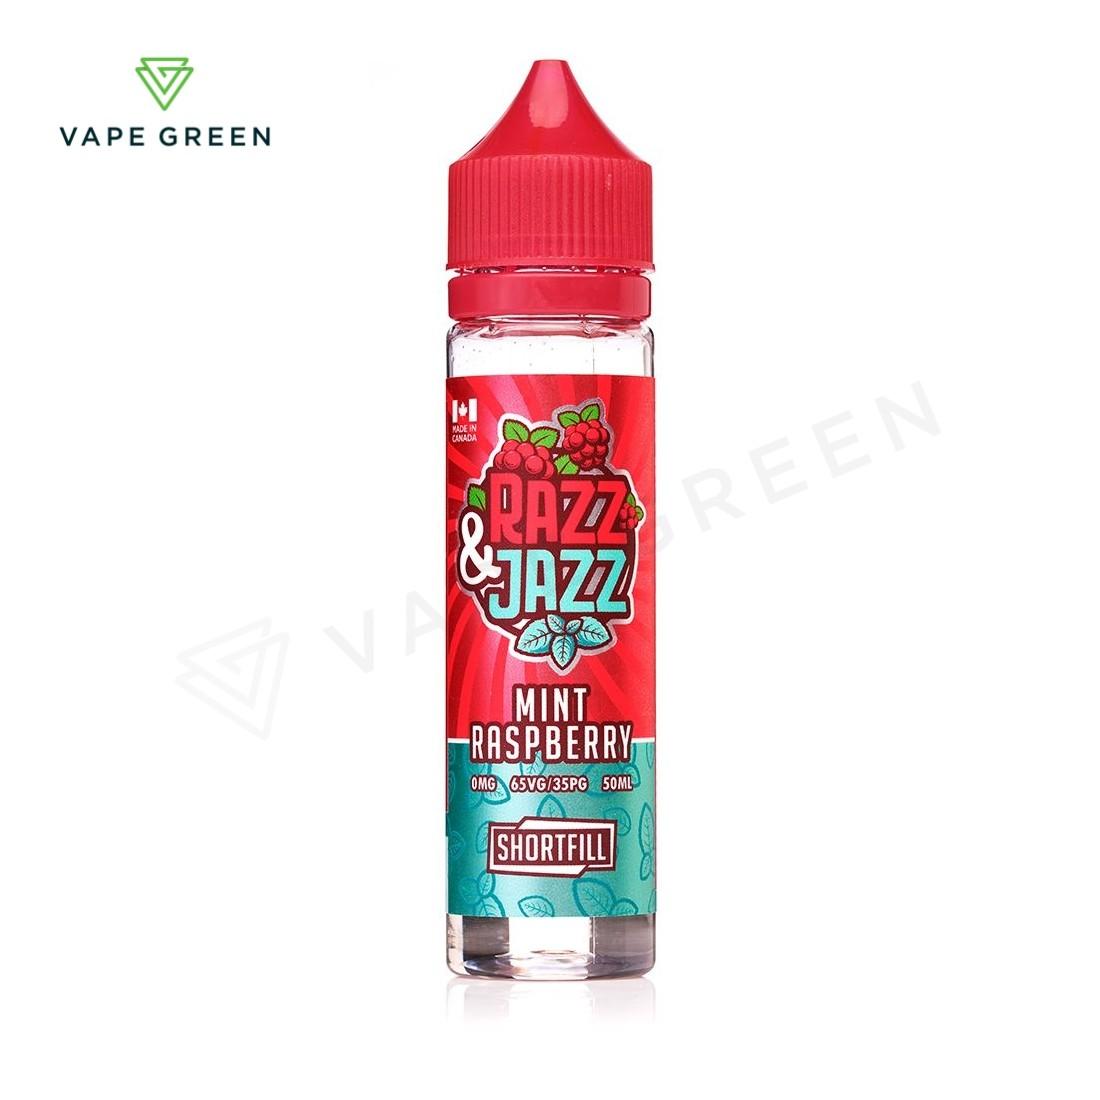 Mint Raspberry Shortfill E-Liquid by Razz & Jazz 50ml